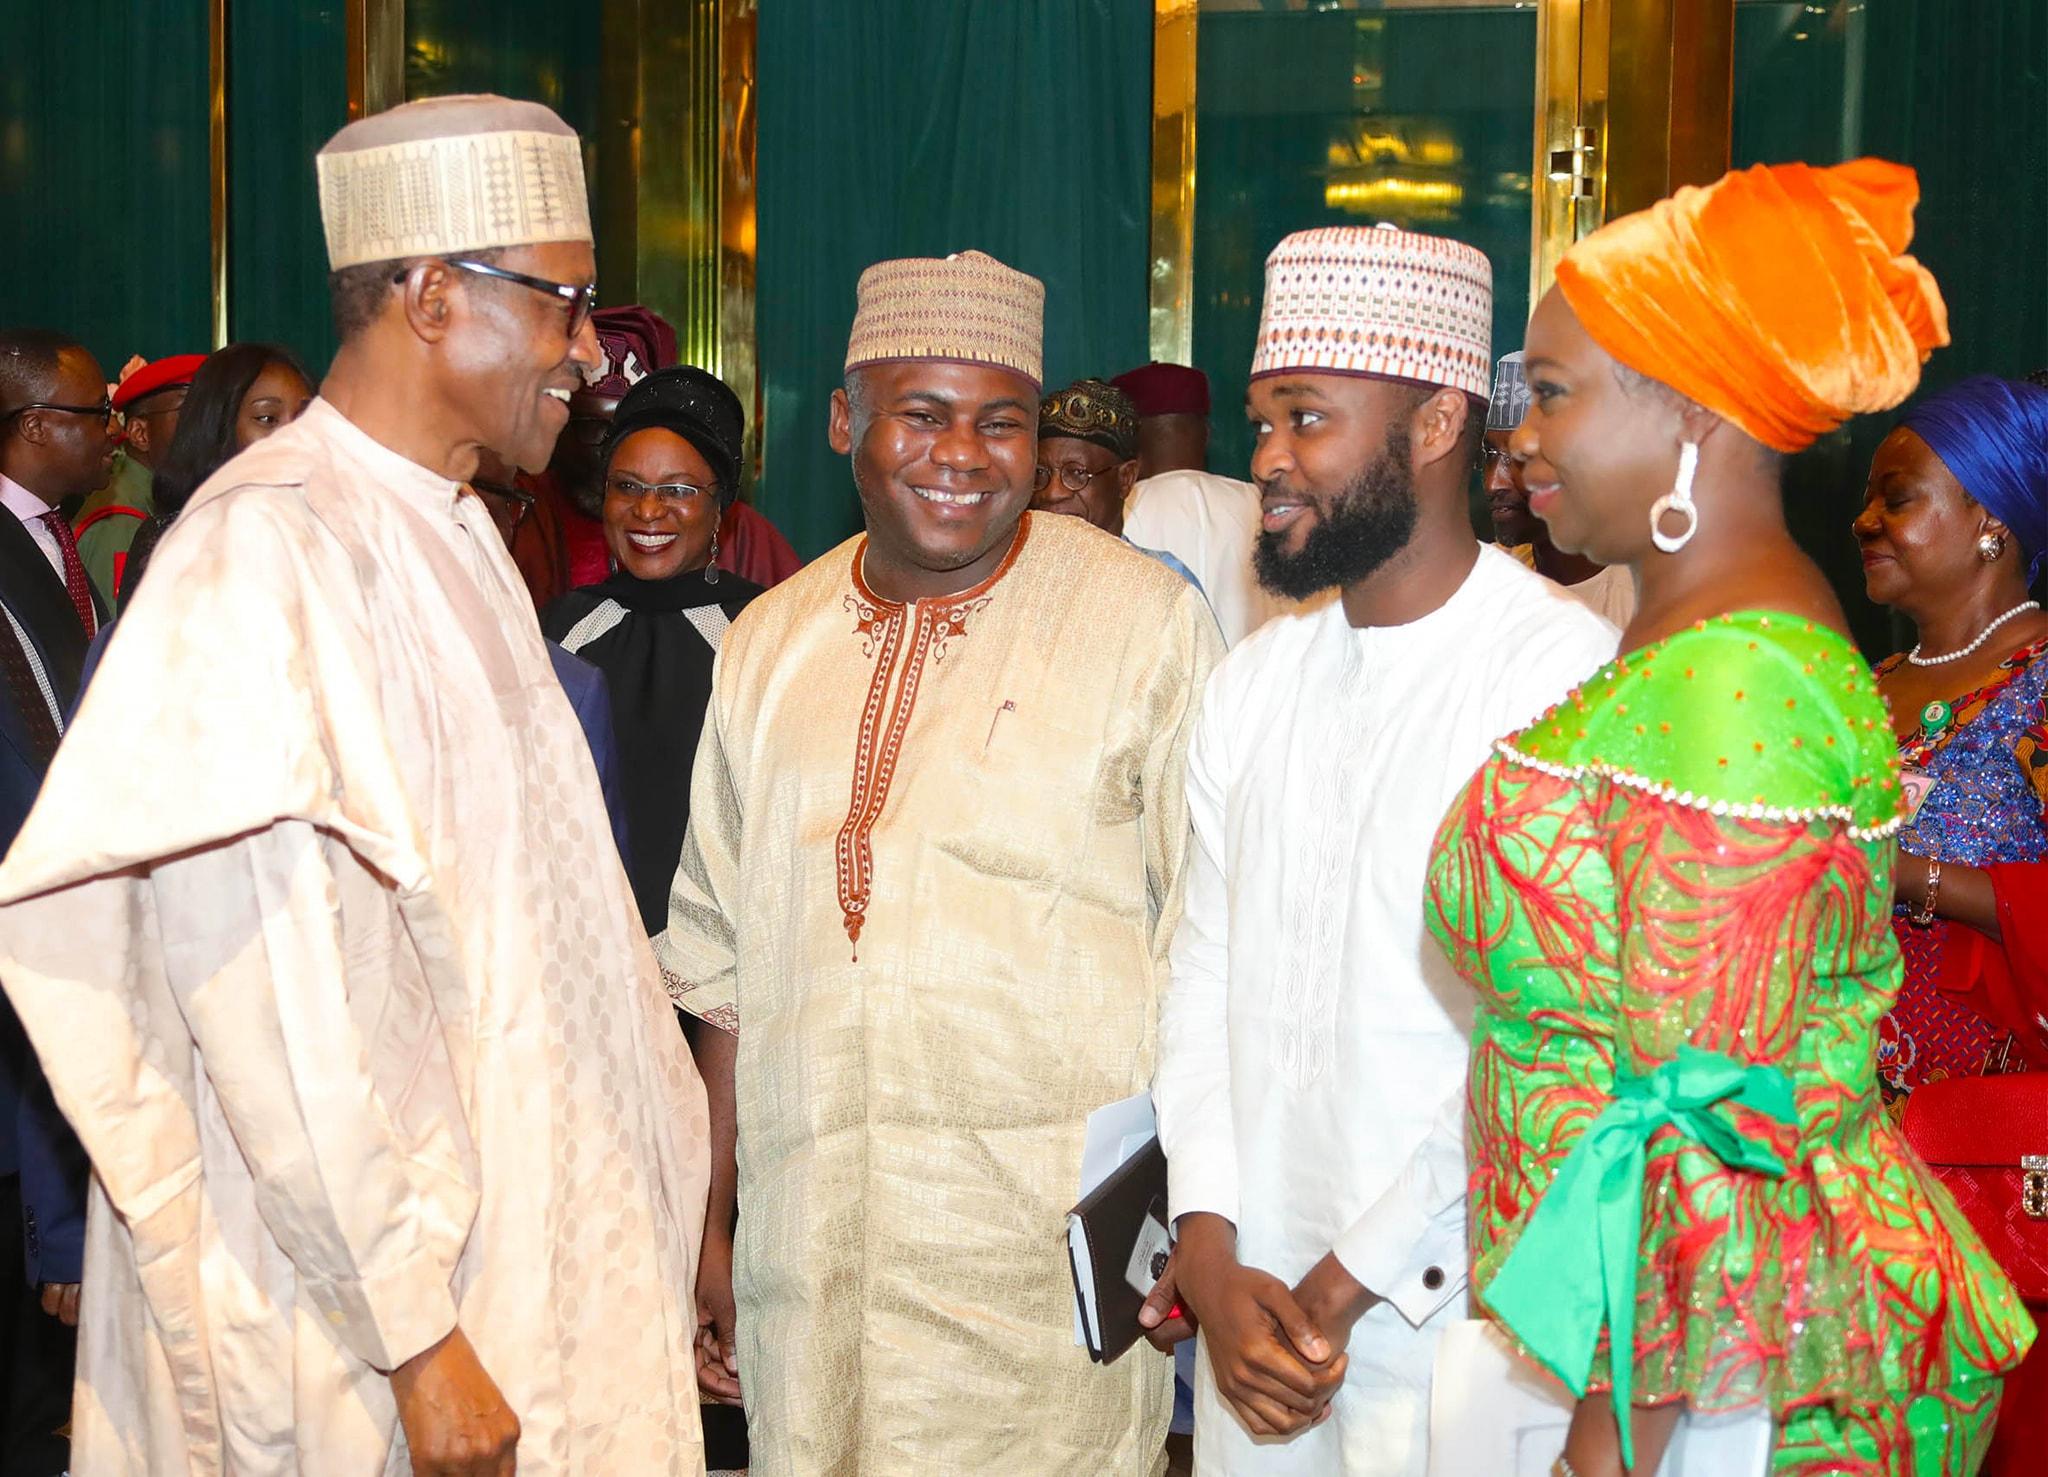 Head Or Tail, You Won't Loose - President Buhari Assures Nigerians In Diaspora